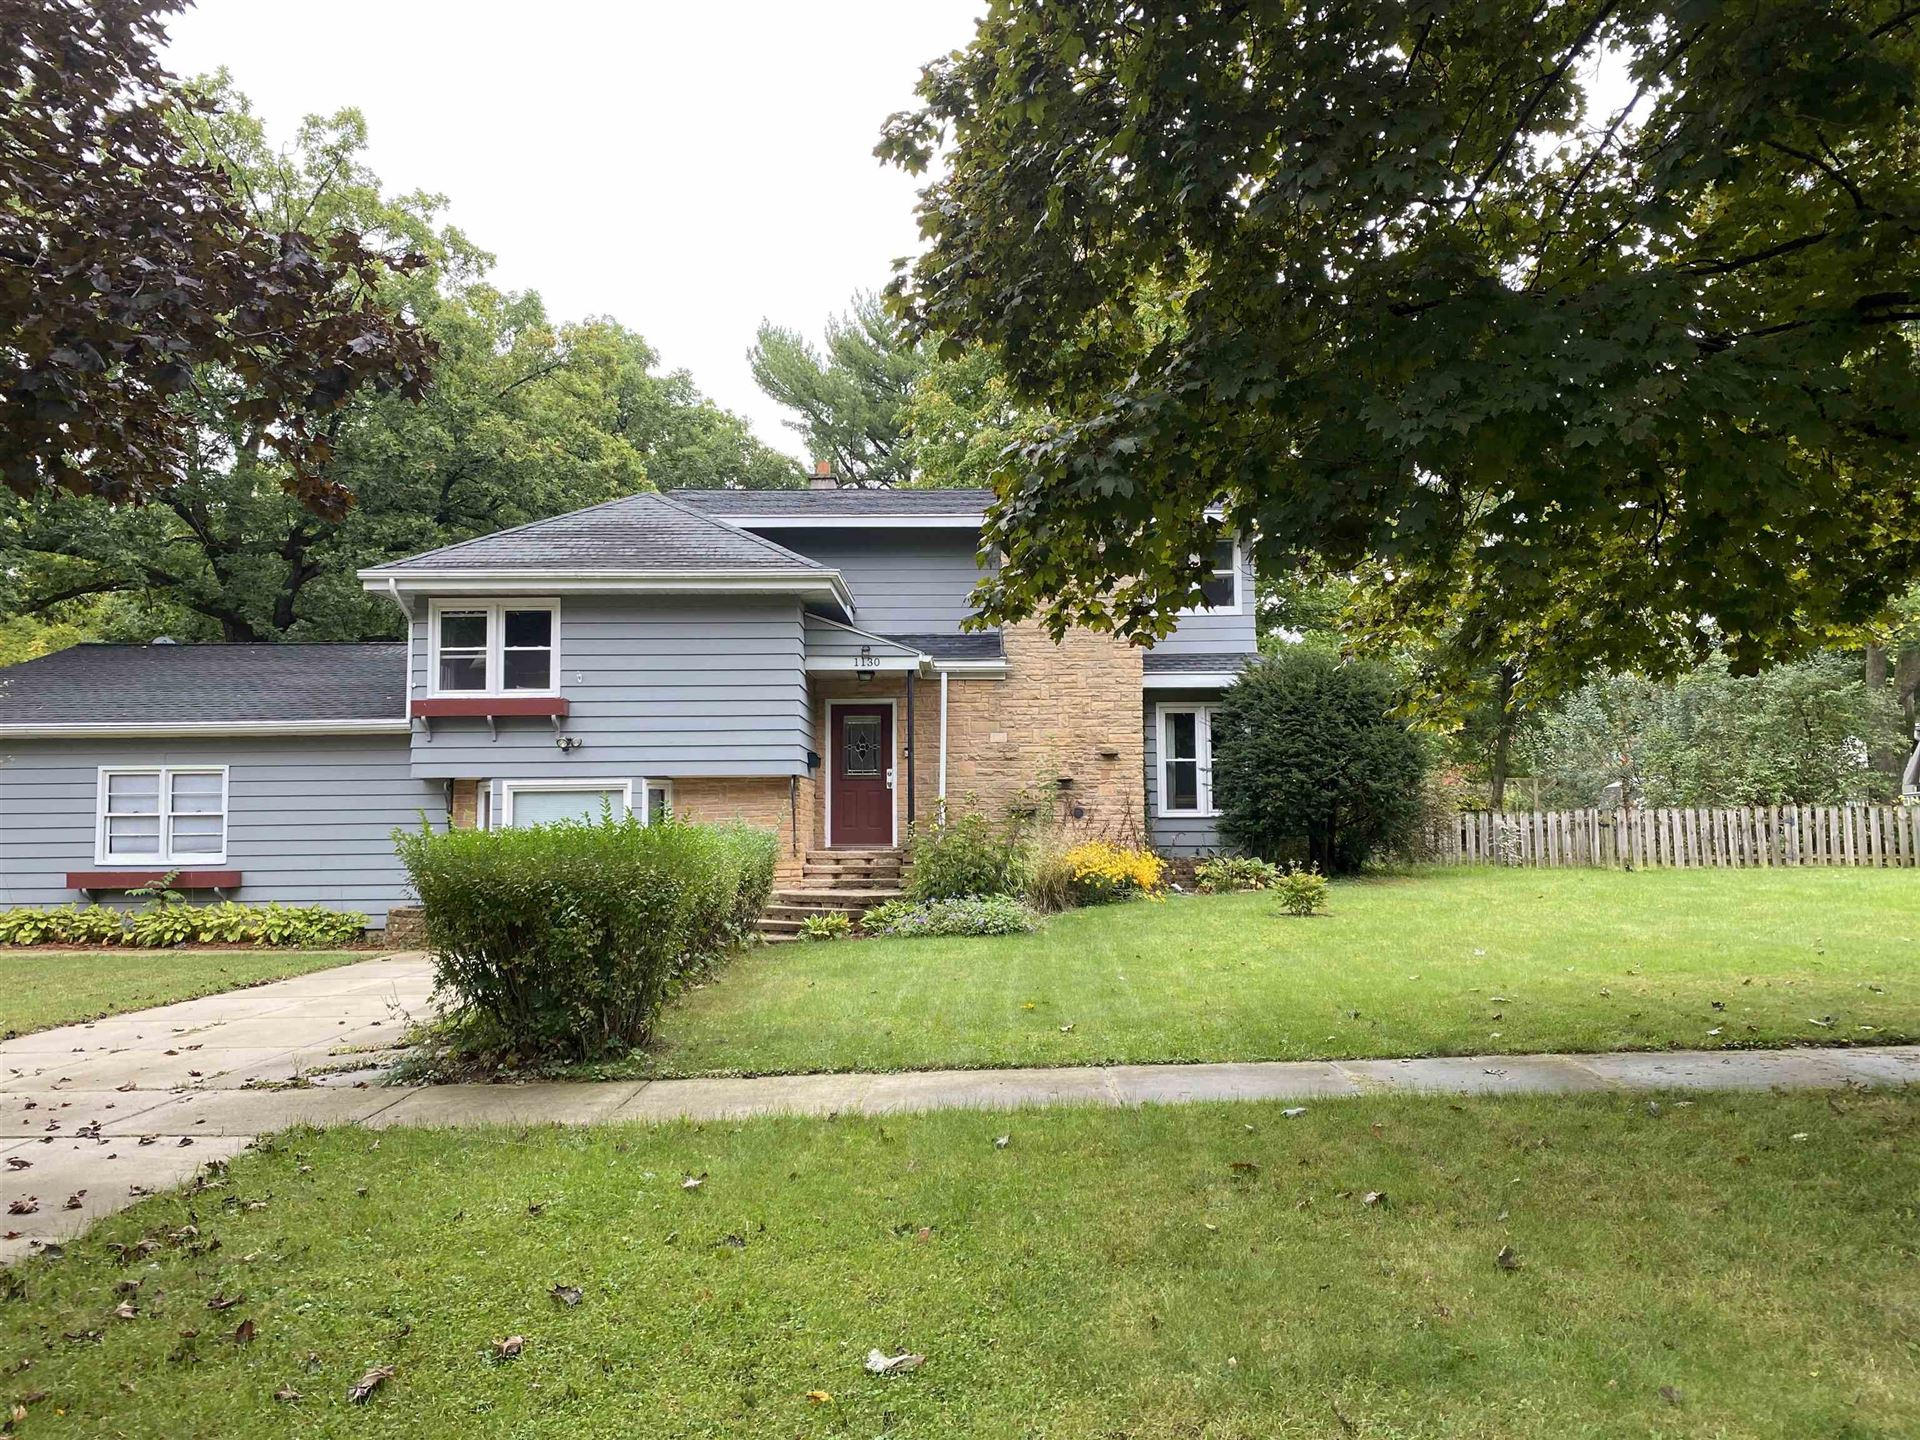 1130 Church St, Wisconsin Dells, WI 53965 - #: 1919691